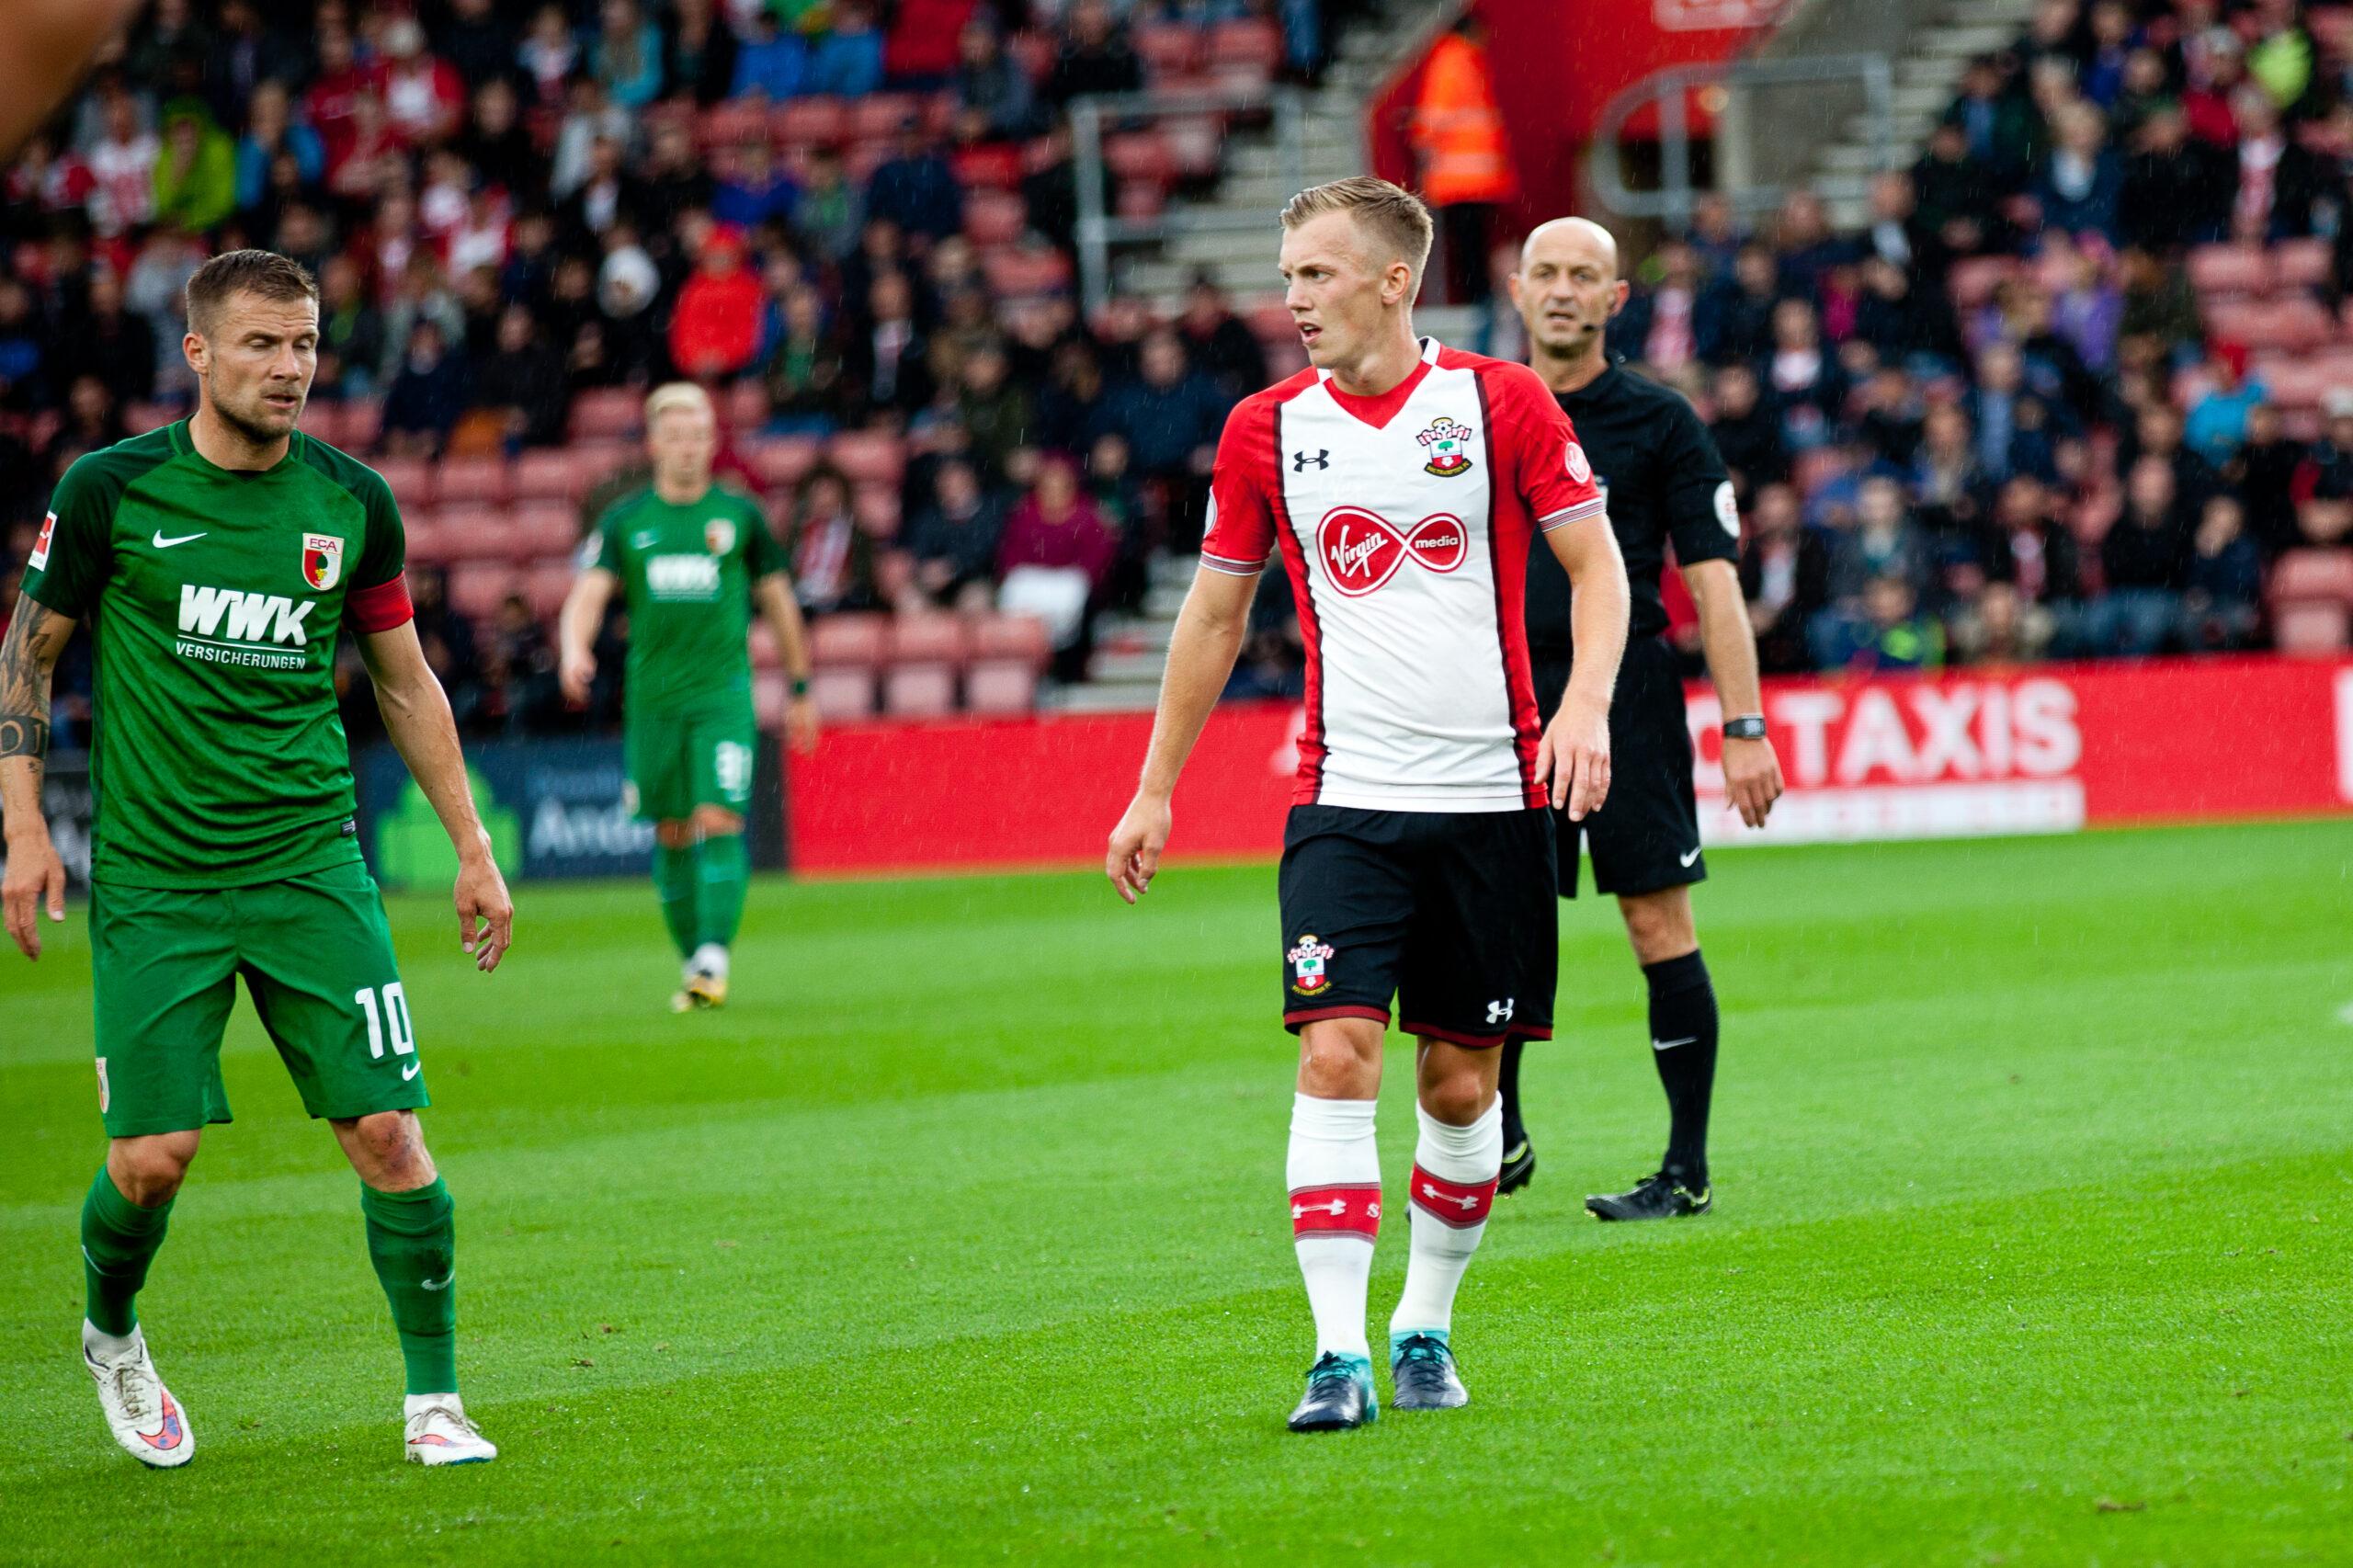 De comeback van Southampton onder leiding van Hasenhüttl